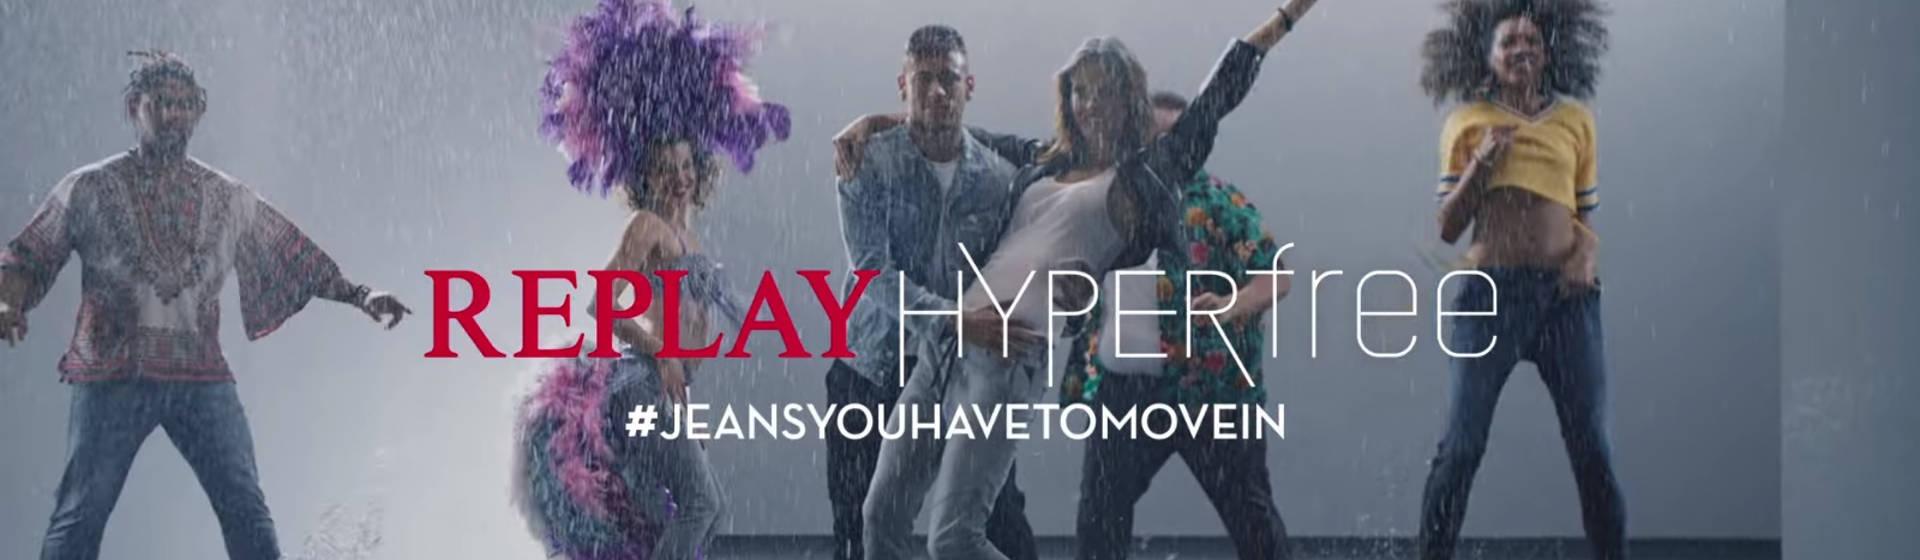 Brand Spotlight: Replay Hyperfree